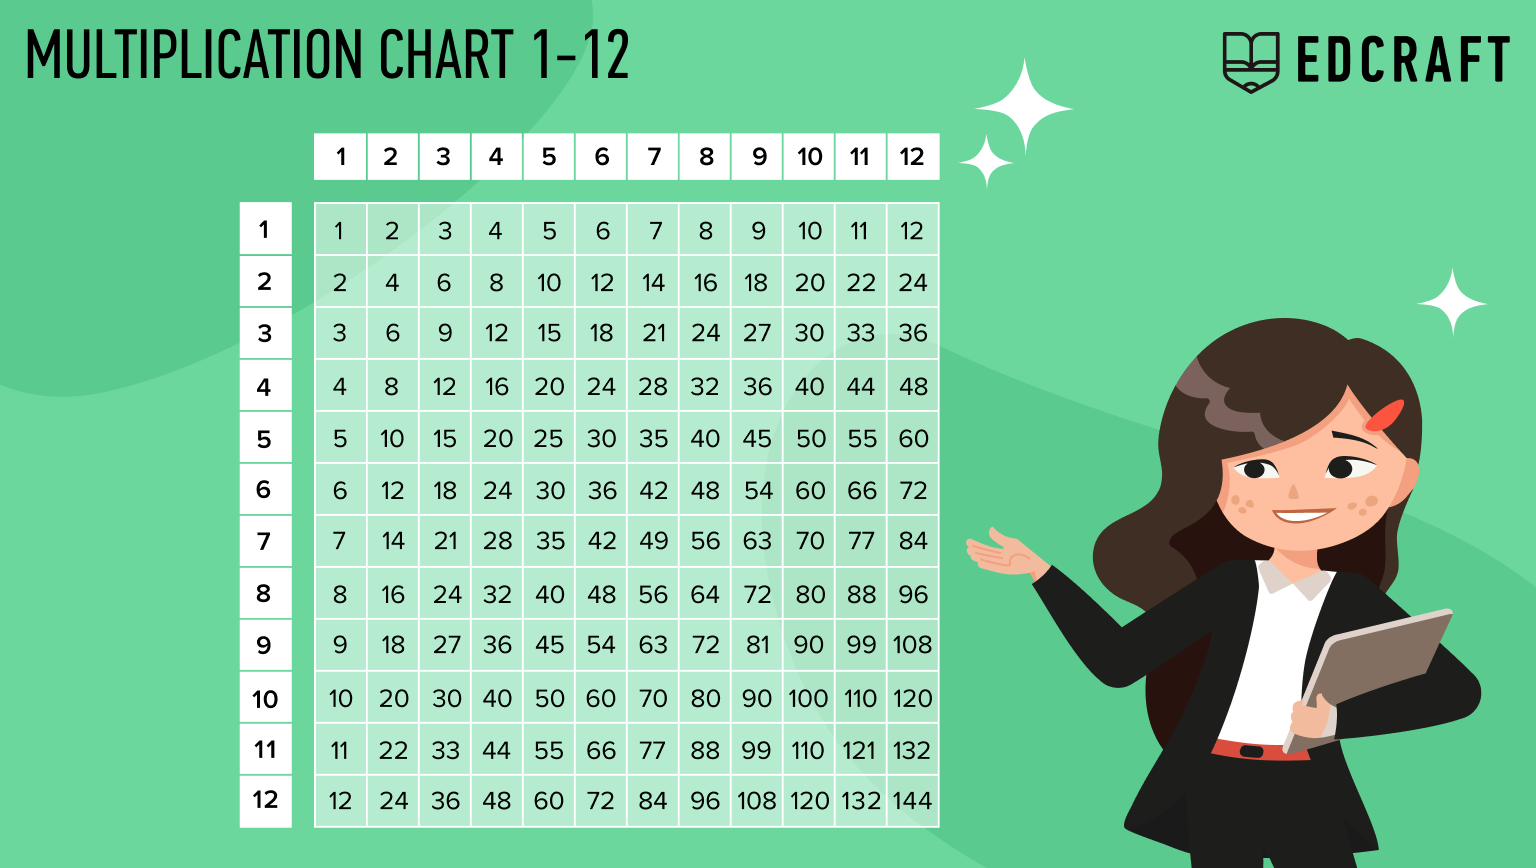 multiplication chart 1-12 printable